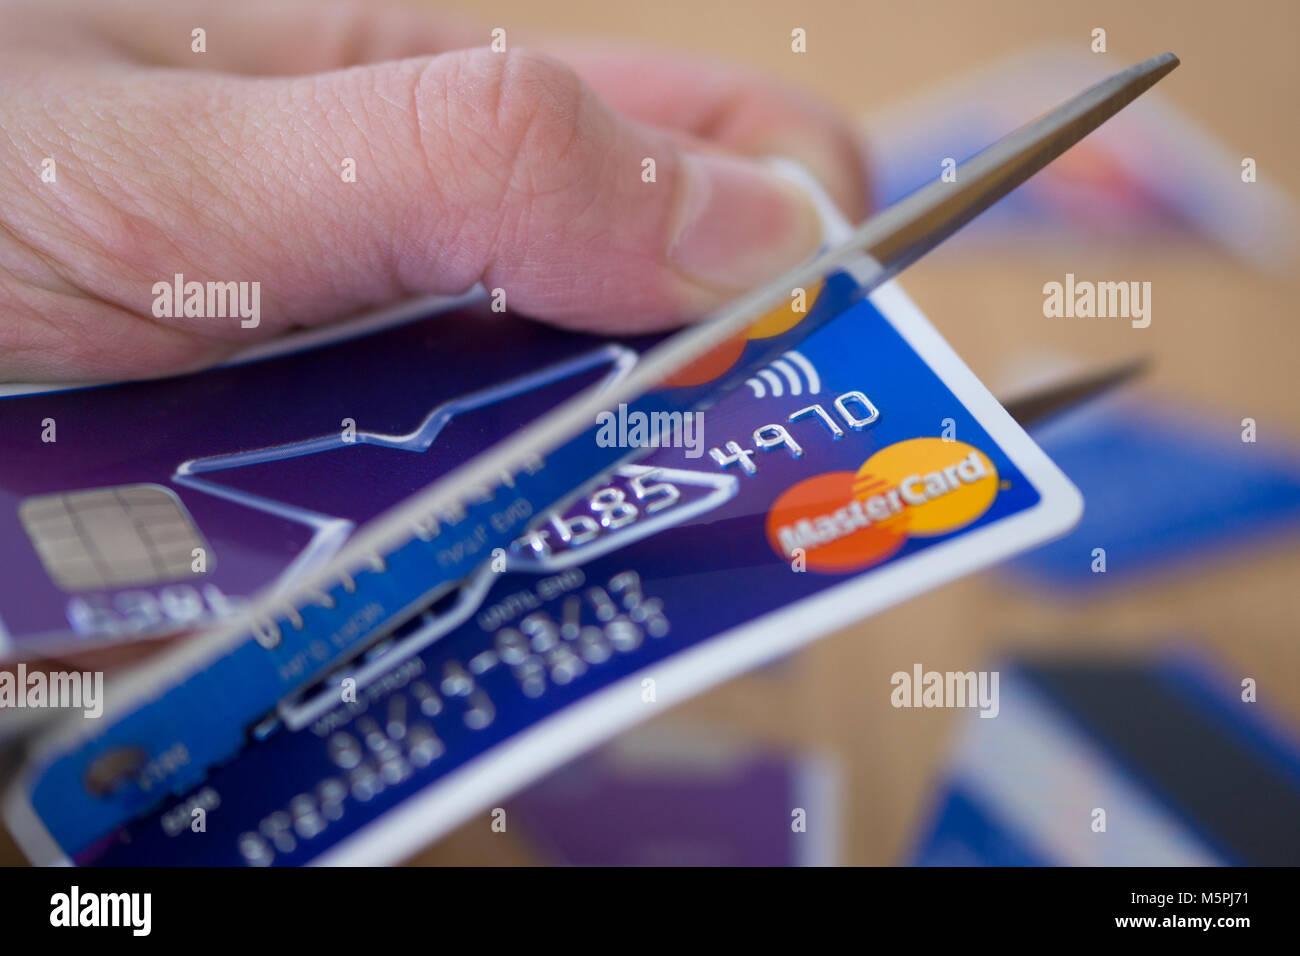 A closeup of a woman cutting up a credit card - credit card debt concept - Stock Image